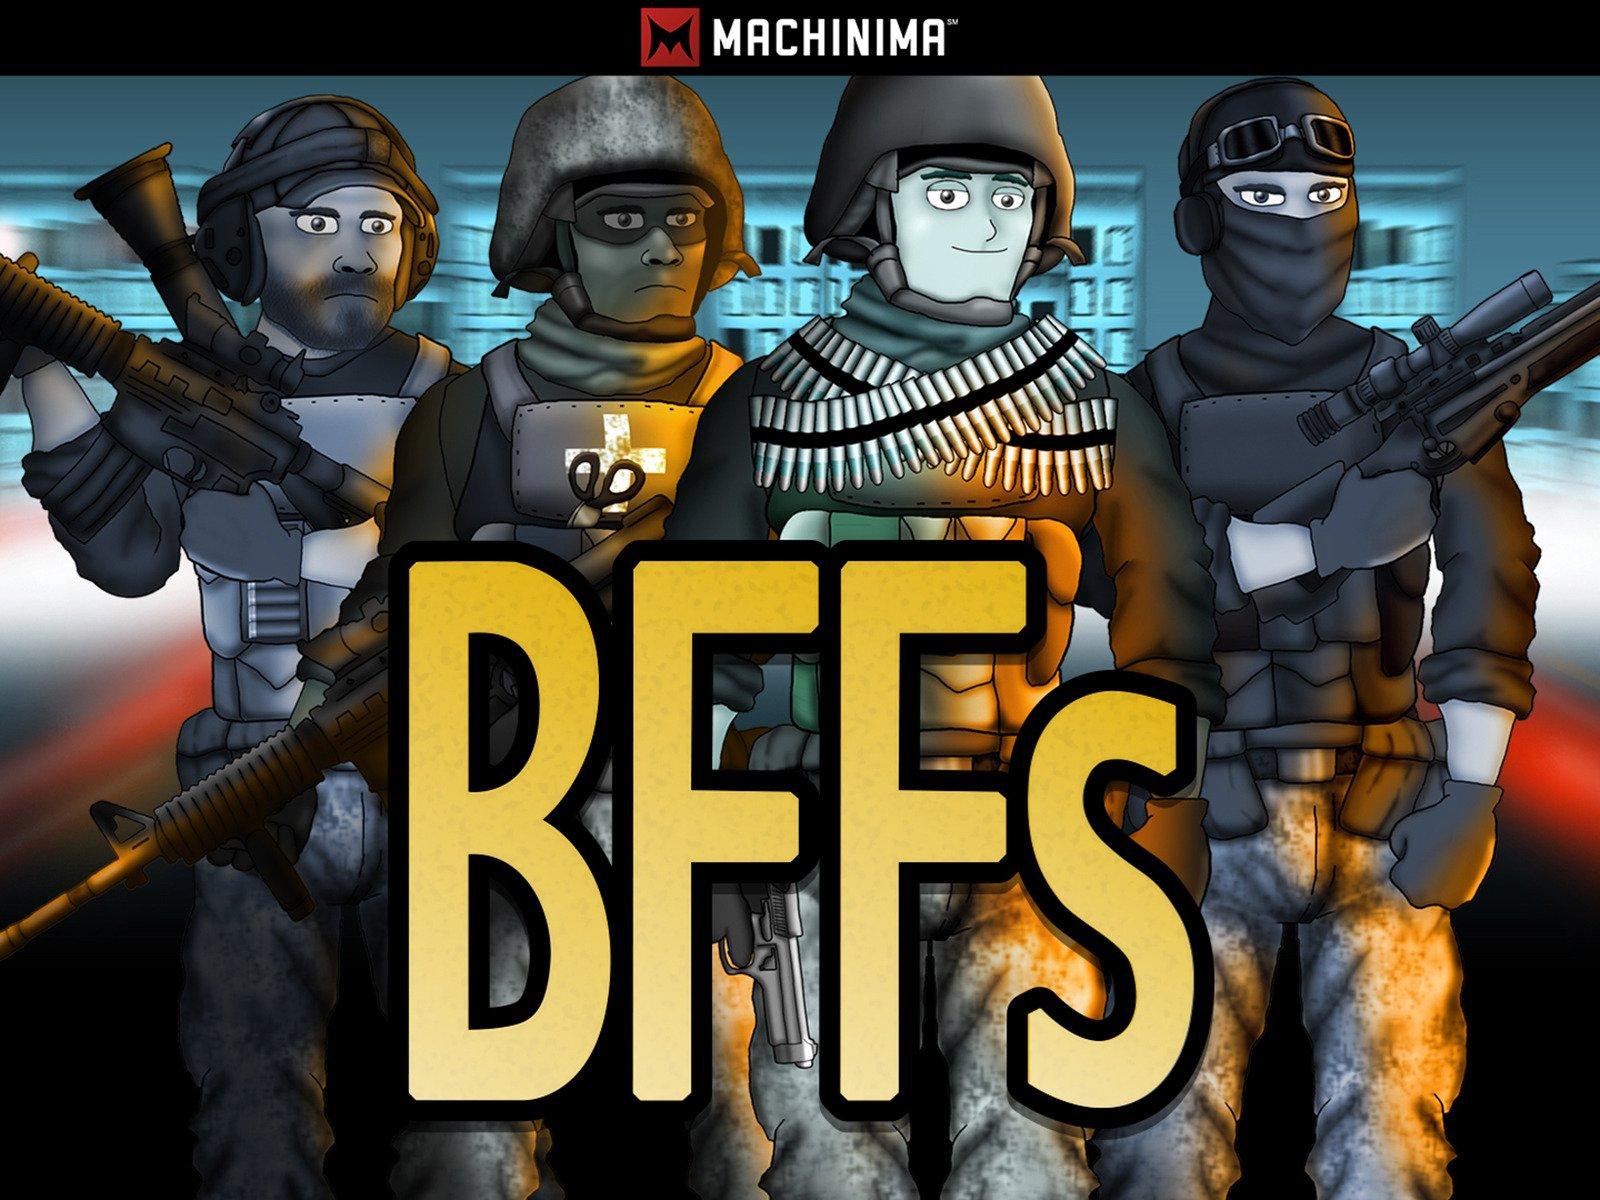 BFFs - Season 5